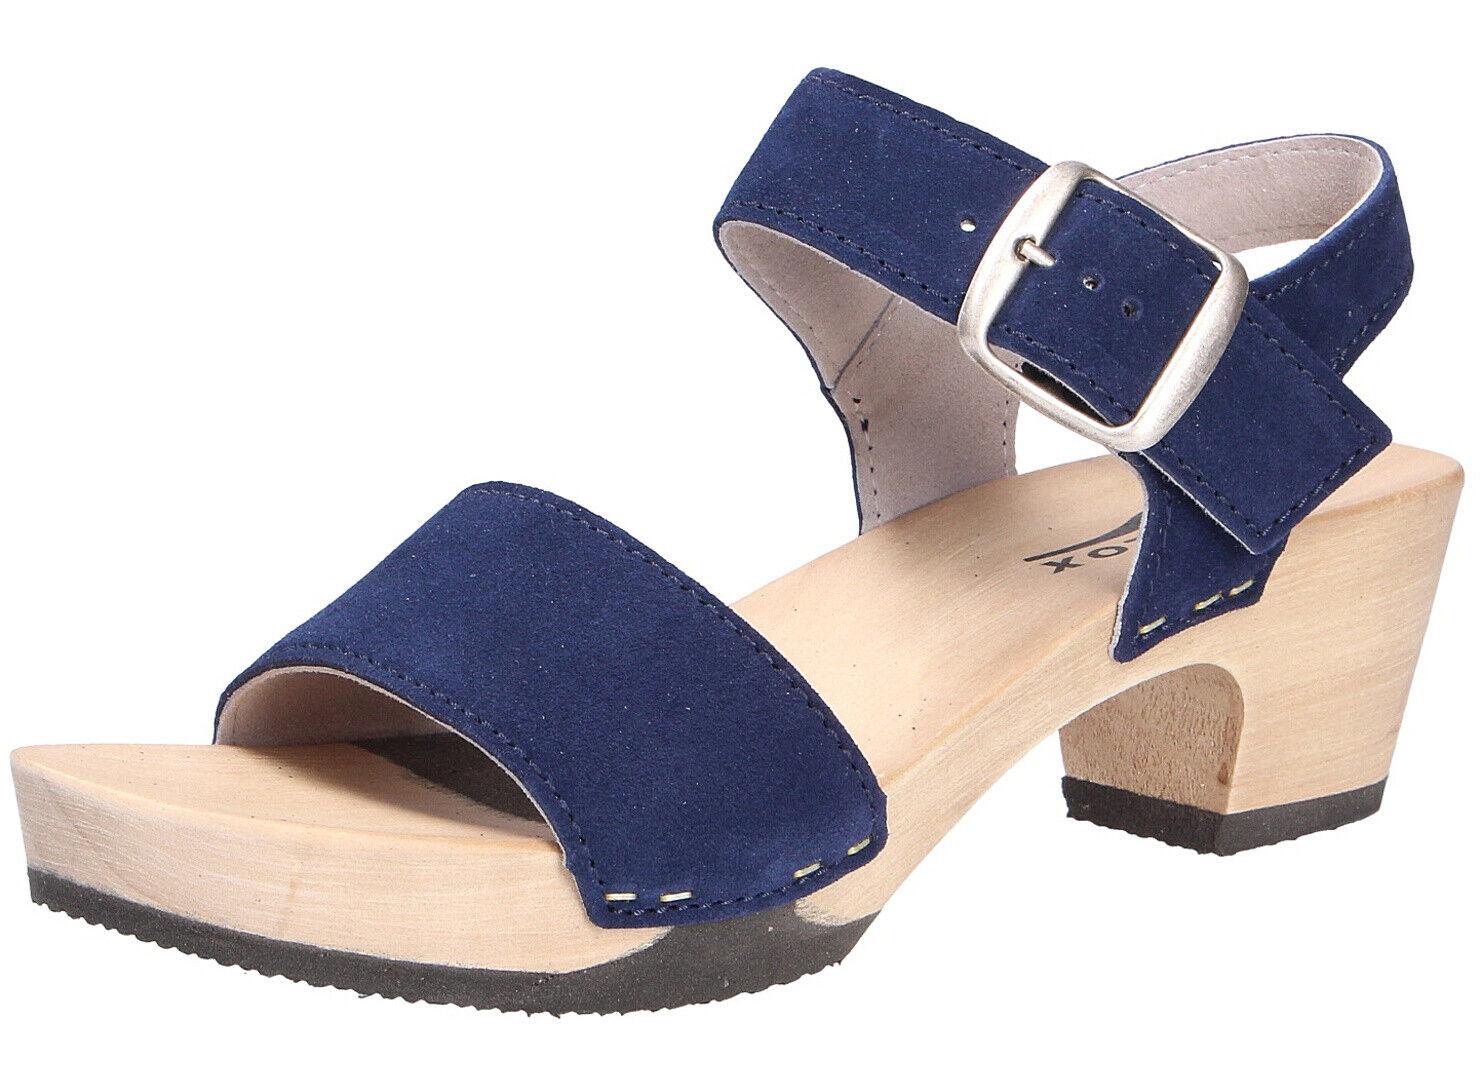 Softclox Damen Fashion Sandale S 3380 NAVY  Kea Blau NEU